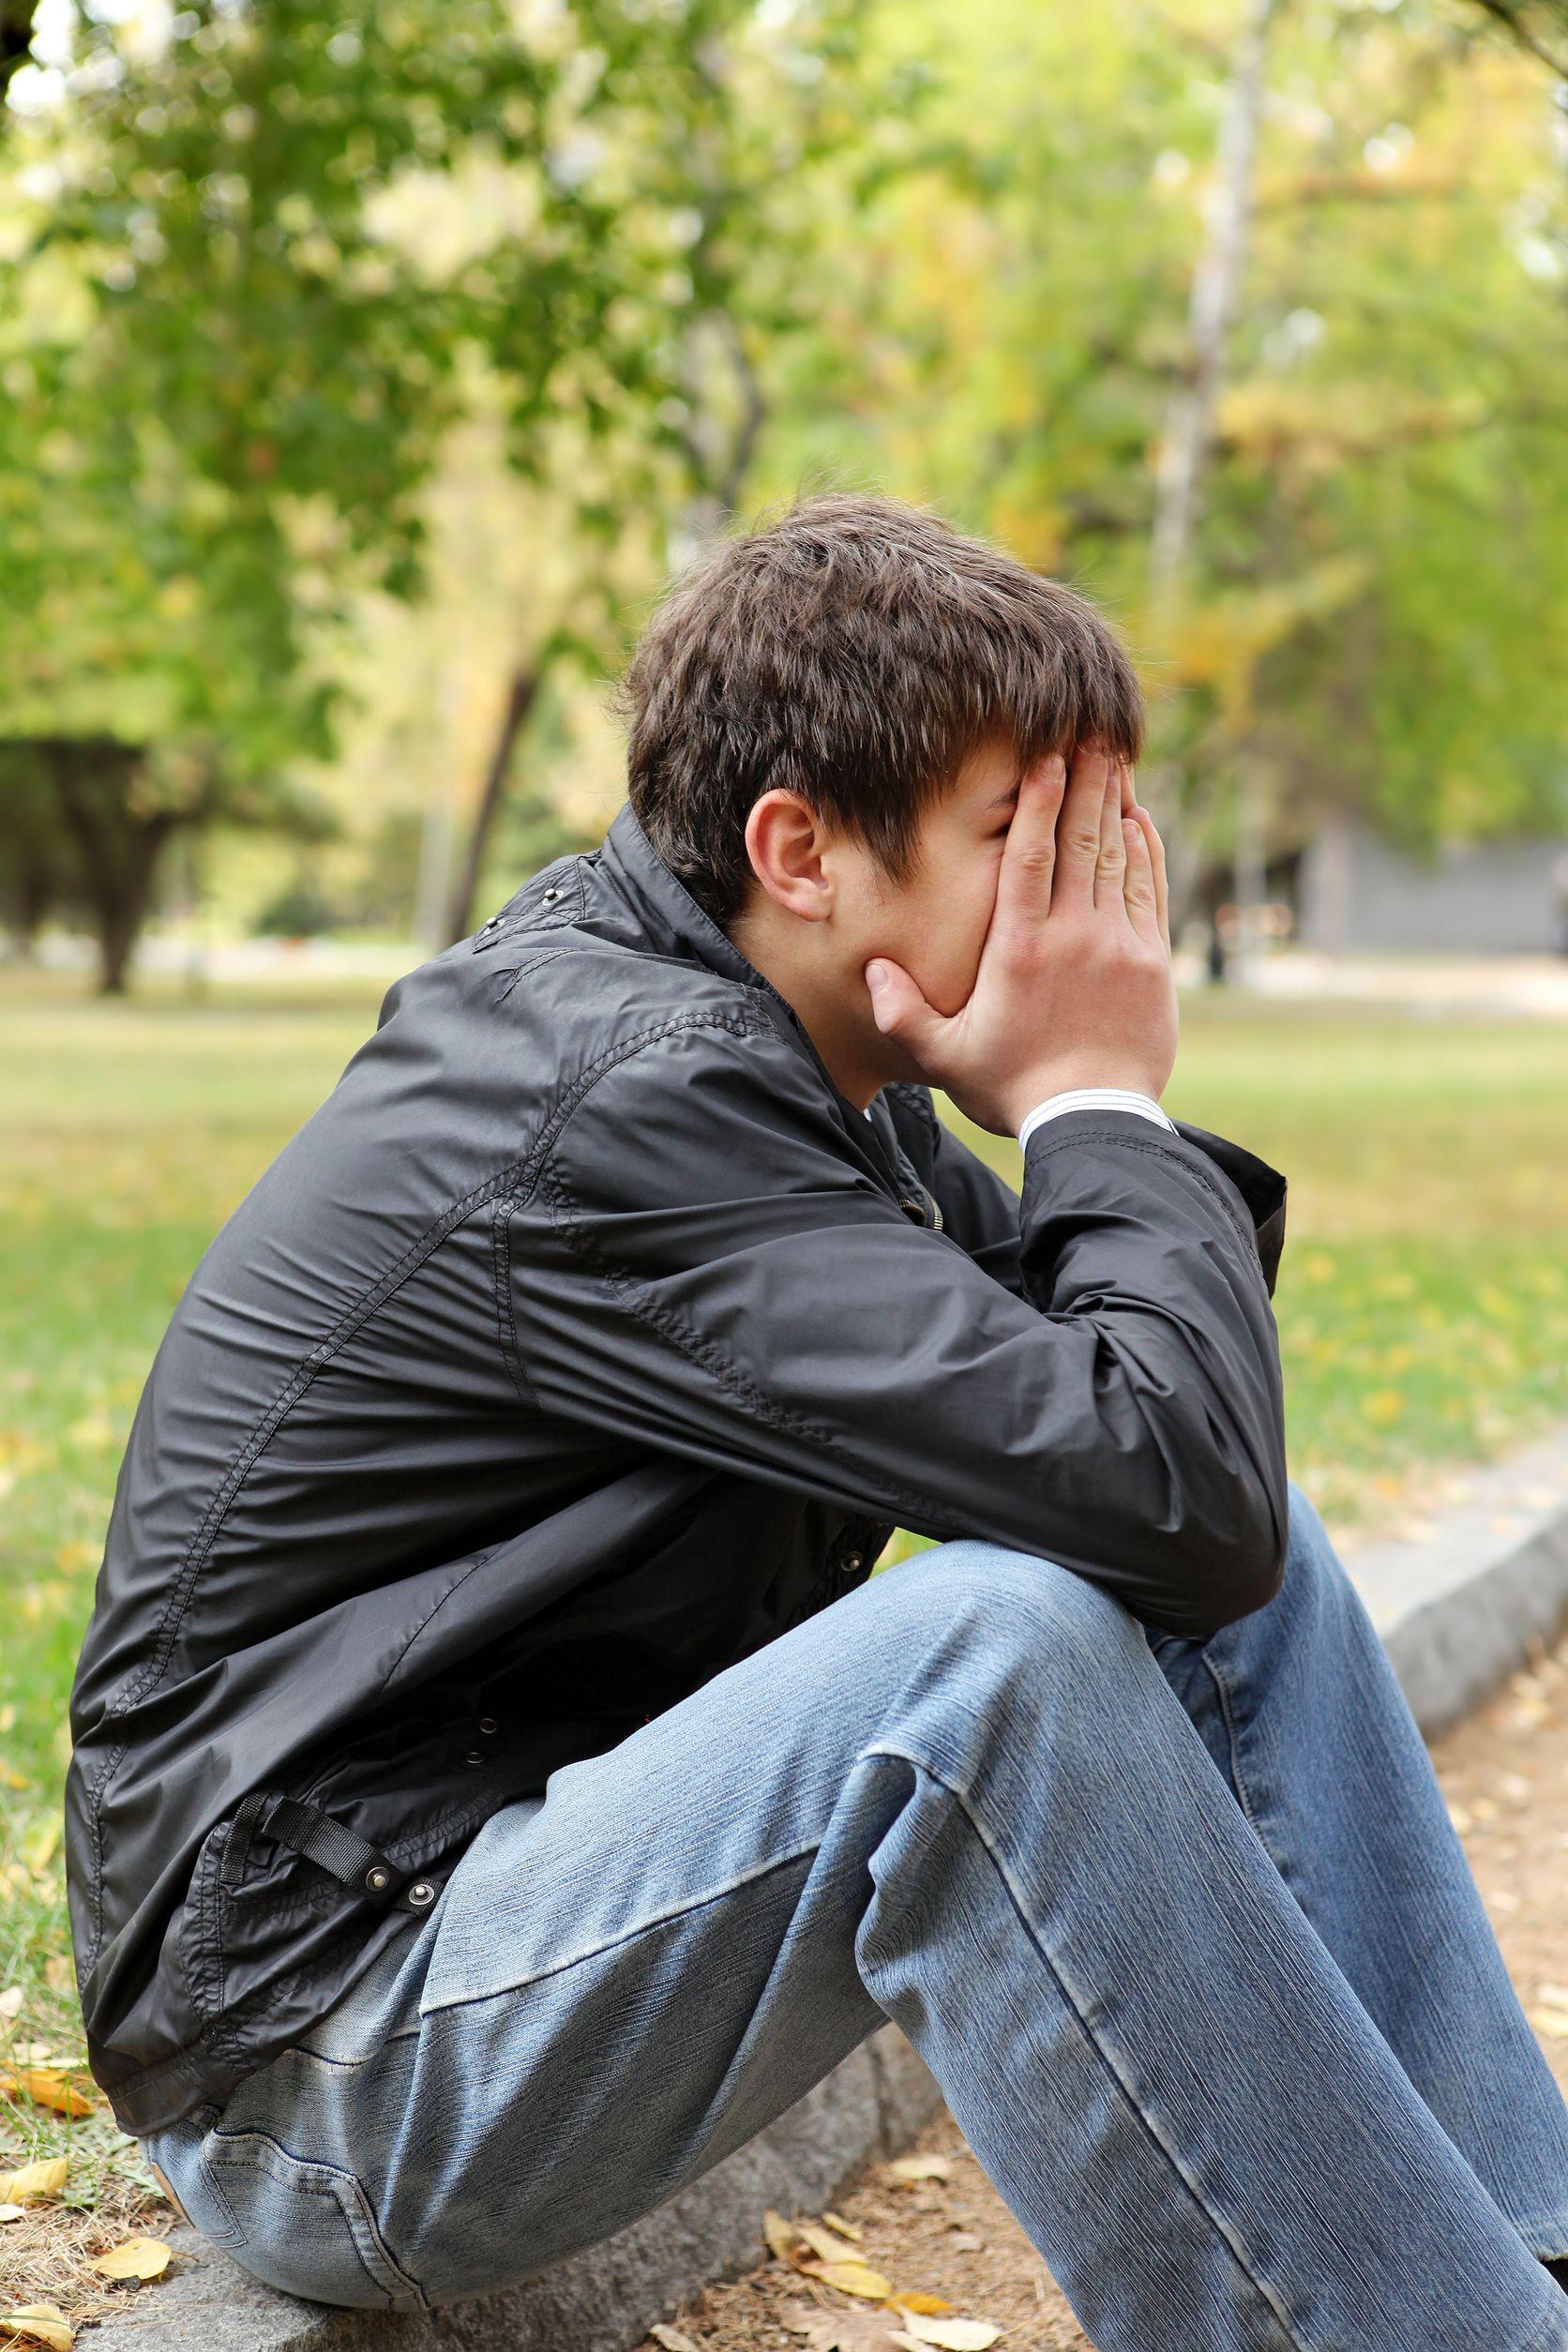 Common Anxiety Types Found in Children